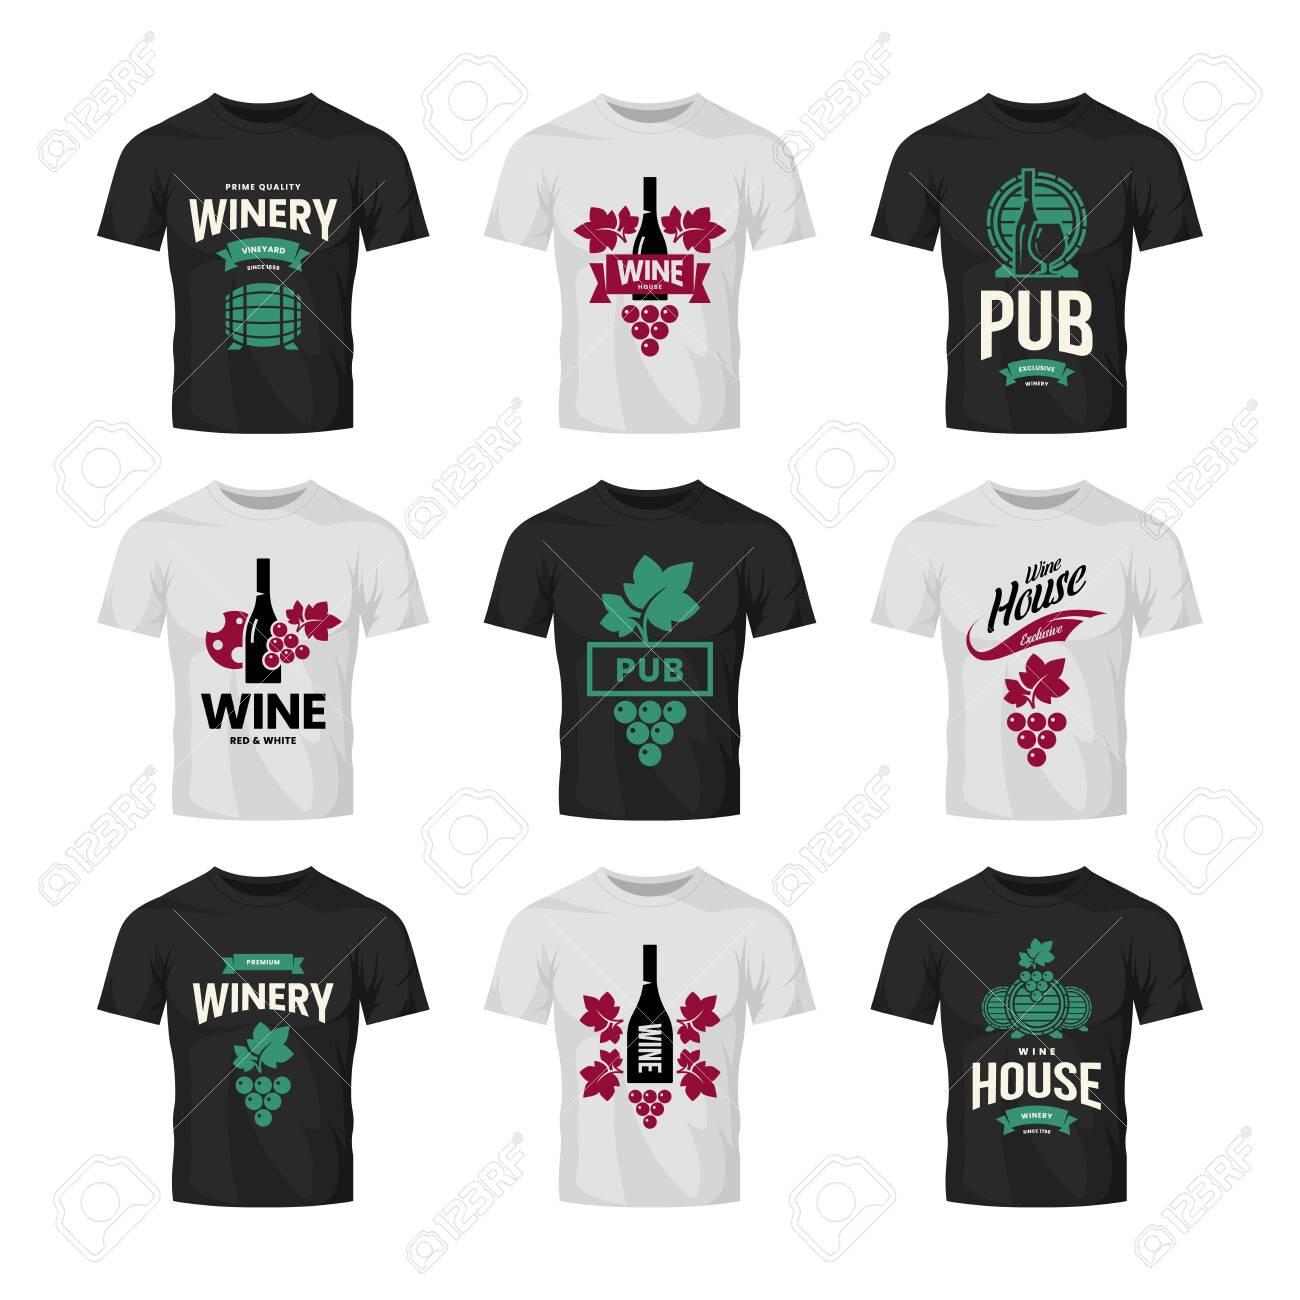 Modern wine vector logo collection for tavern, restaurant, shop, store, club and cellar on t-shirt mock up. Premium quality vinery logotype illustration set. Fashion brand badge design template bundle. - 120438822